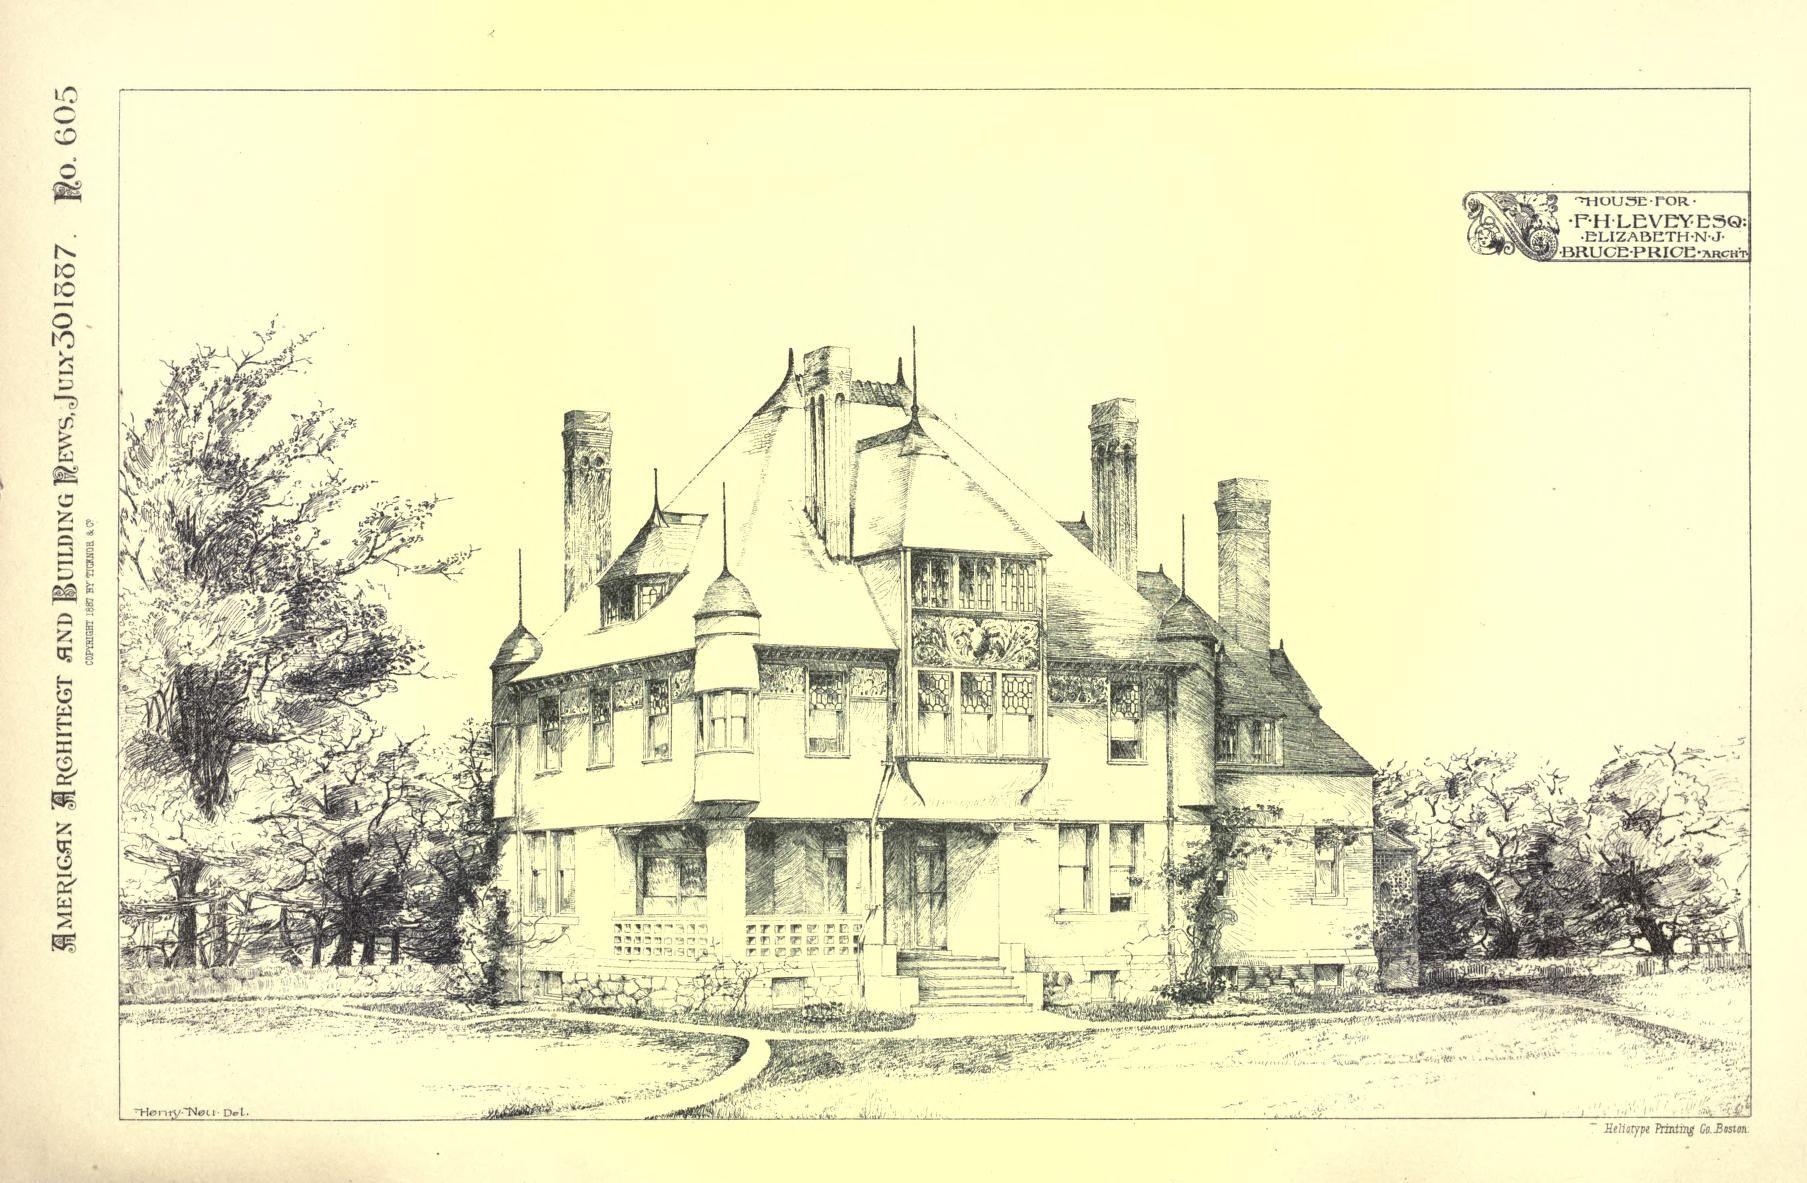 NJ Elizabeth Levey Res Bruce Price House painting, House